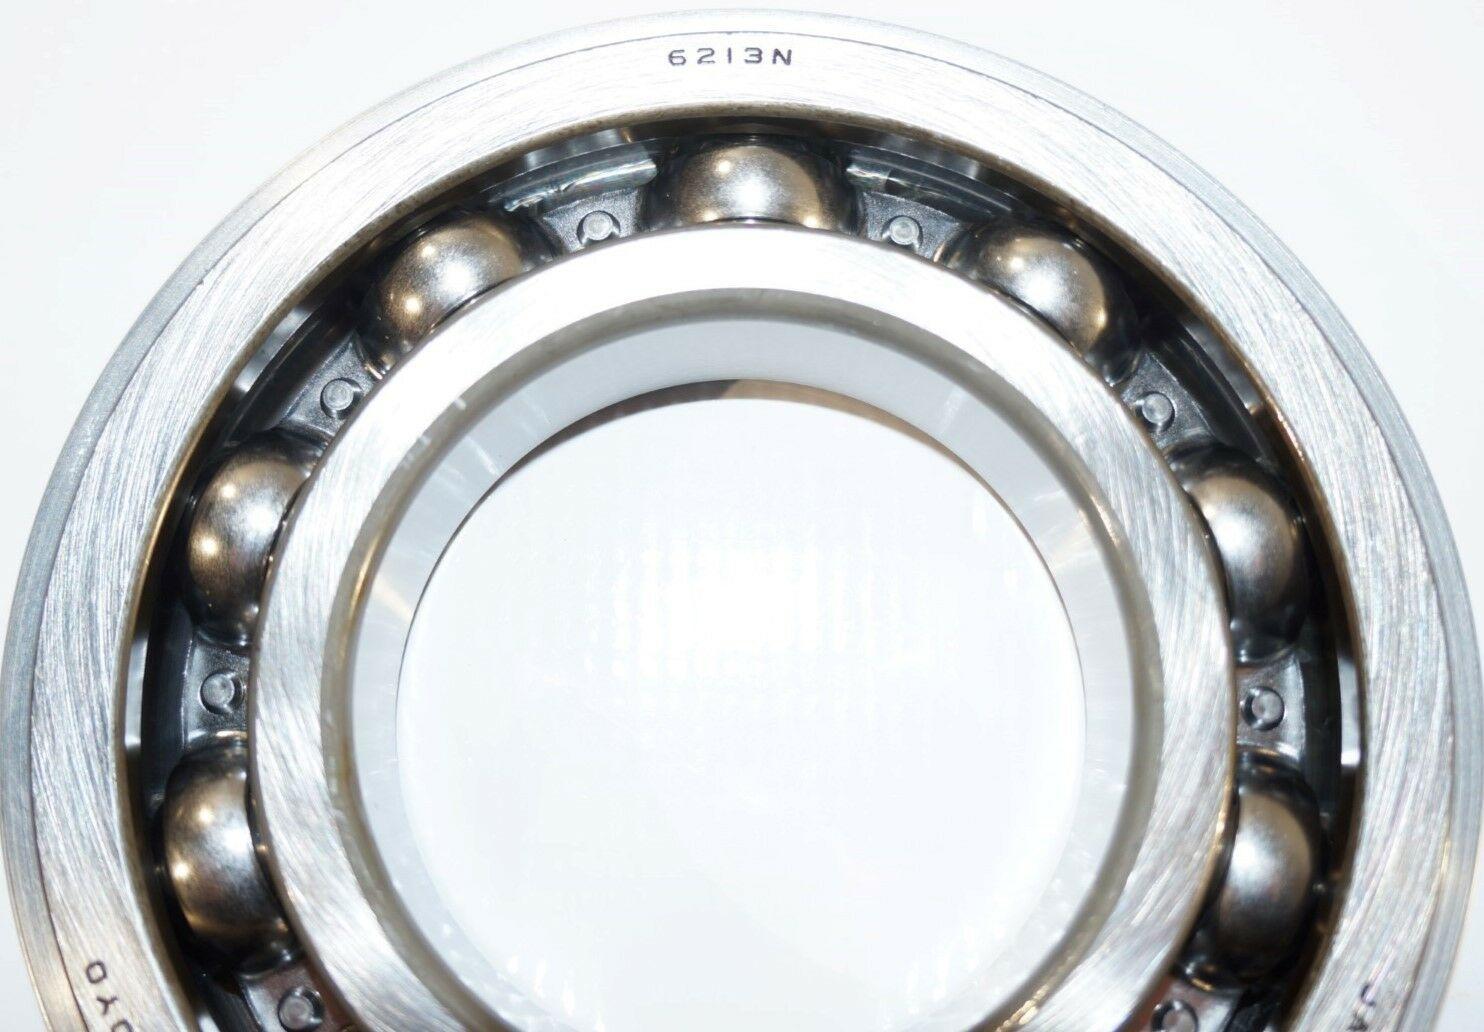 New OEM Premium Deep Groove Ball Bearing 6213N Mack 25096423 Made in Japan